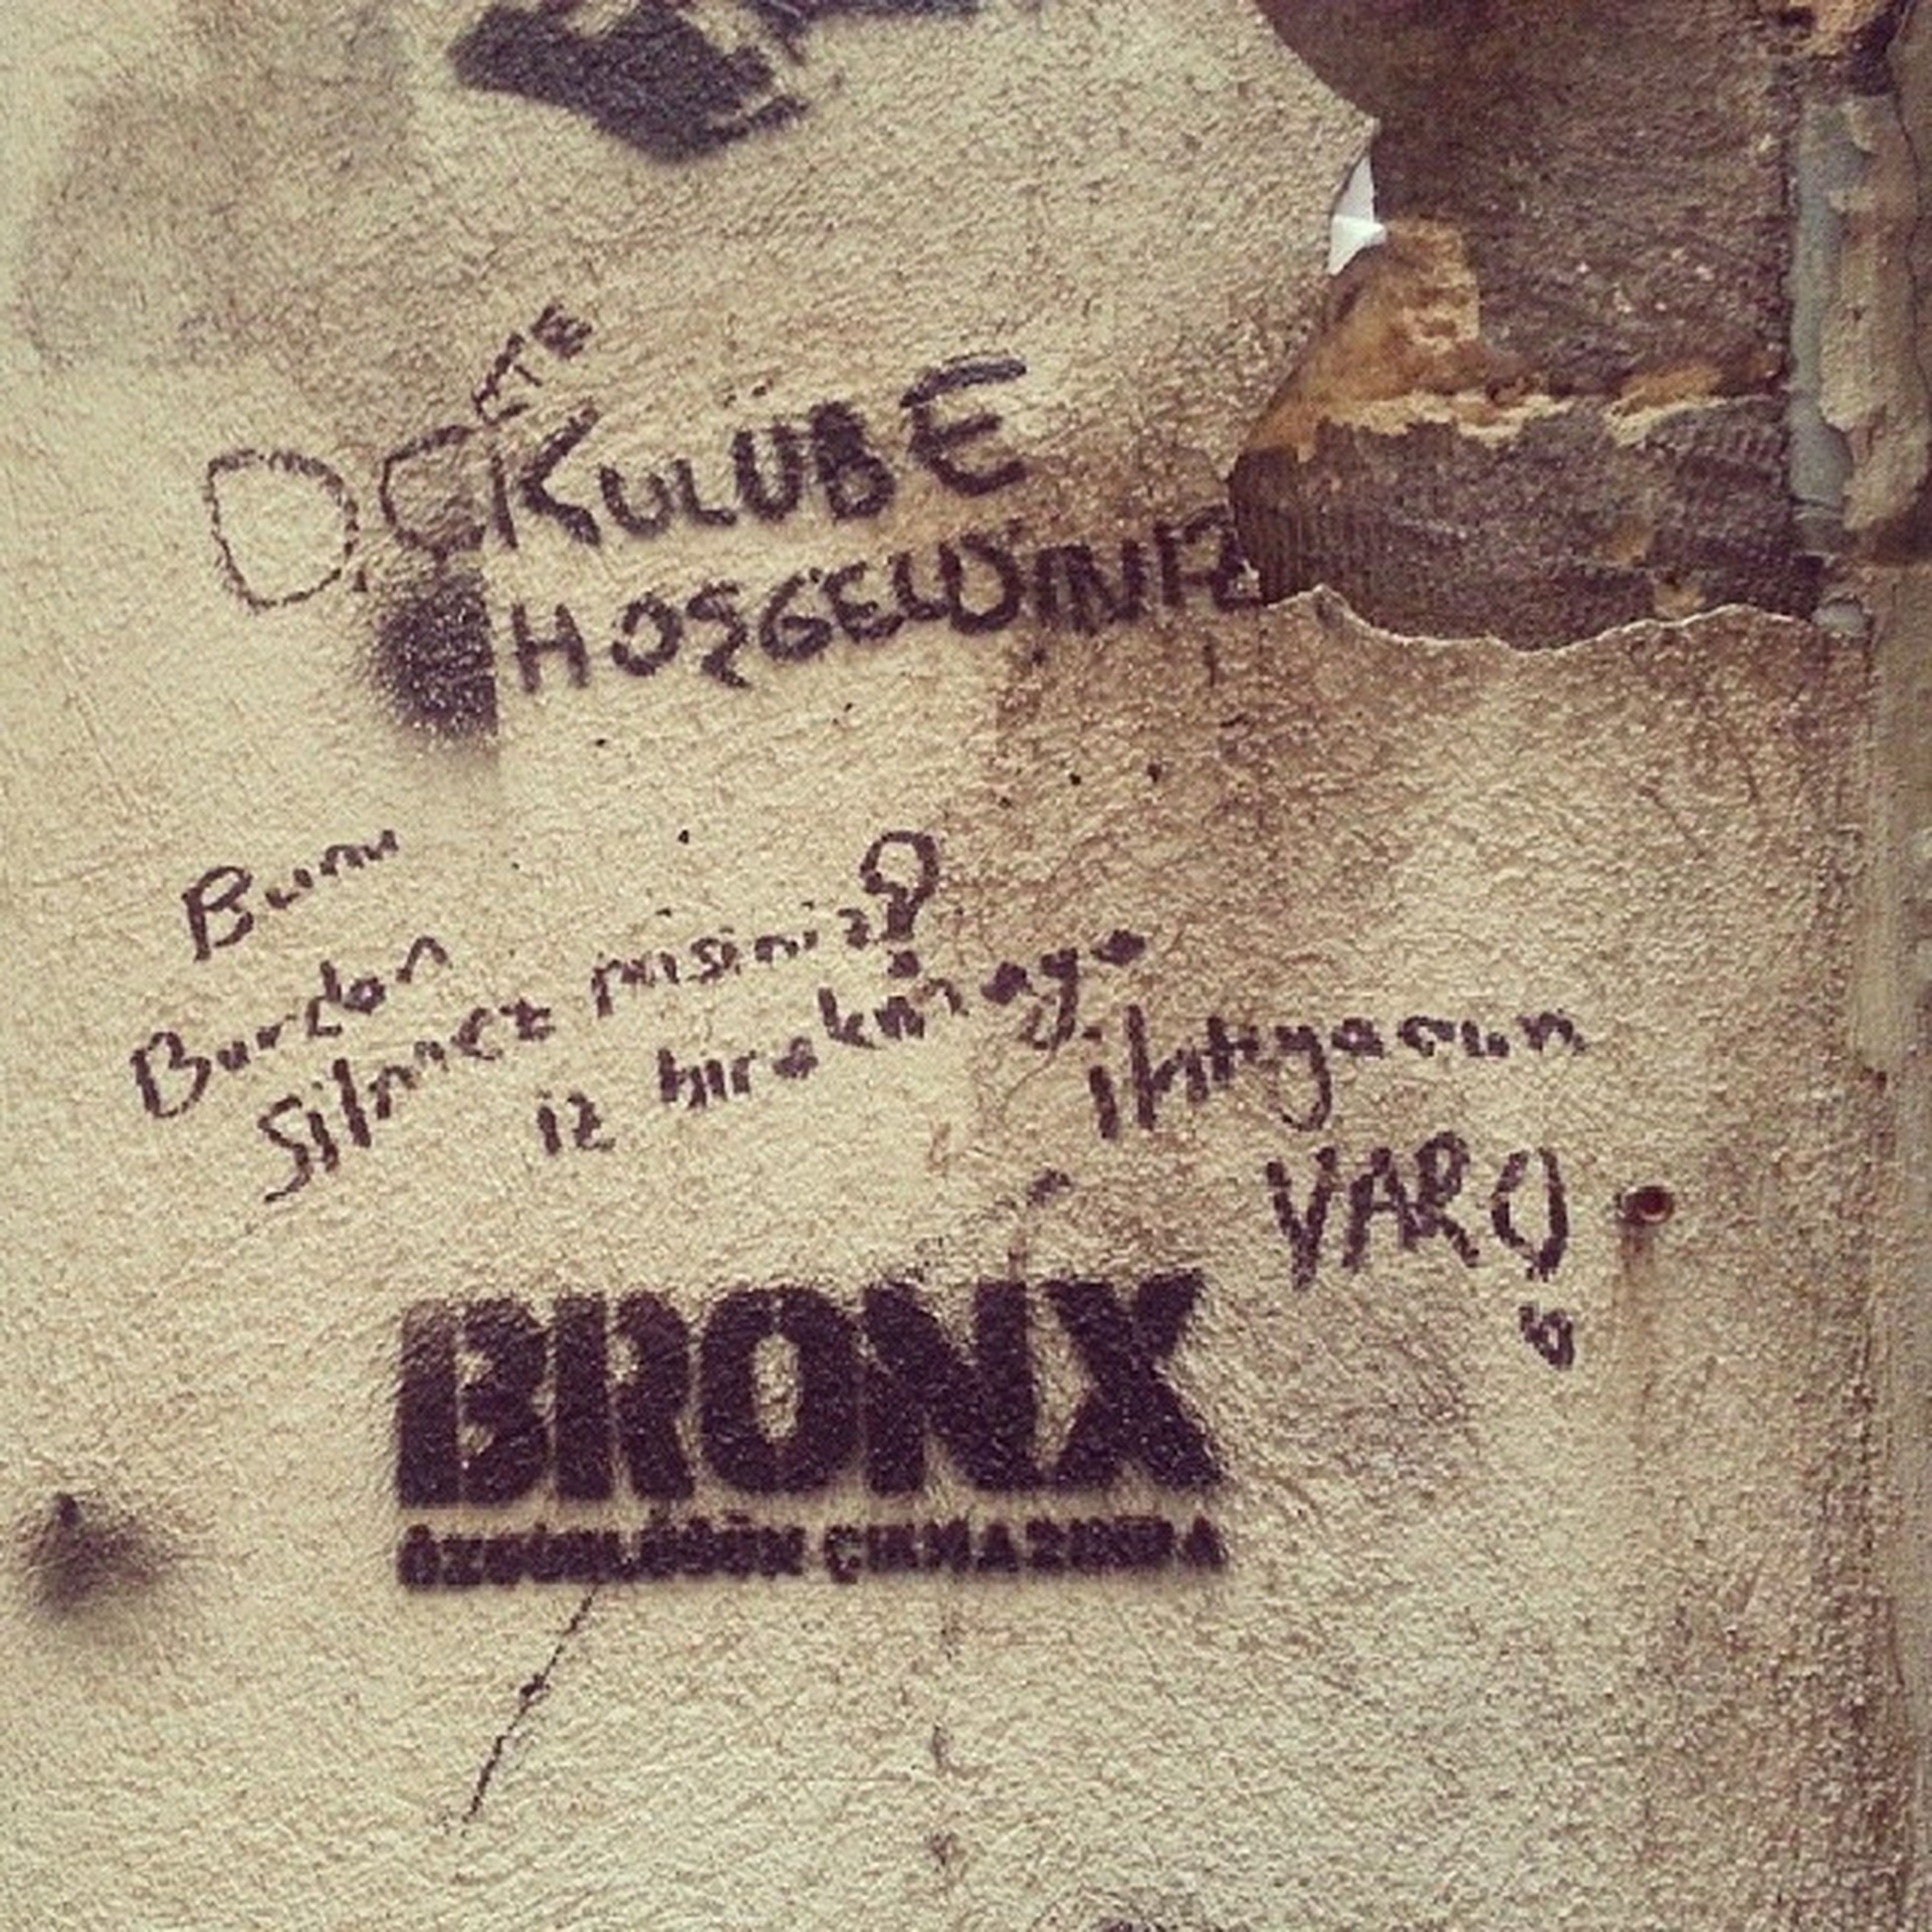 Grafiti Art Urban Wall streetart graff streetartistry street spray buildinggraffiti wallart rue streetphotography instagraffiti urbano artist colour tagstagram color handmade instalike istanbul beyoglu animation imagen arte collage blue instapic snk